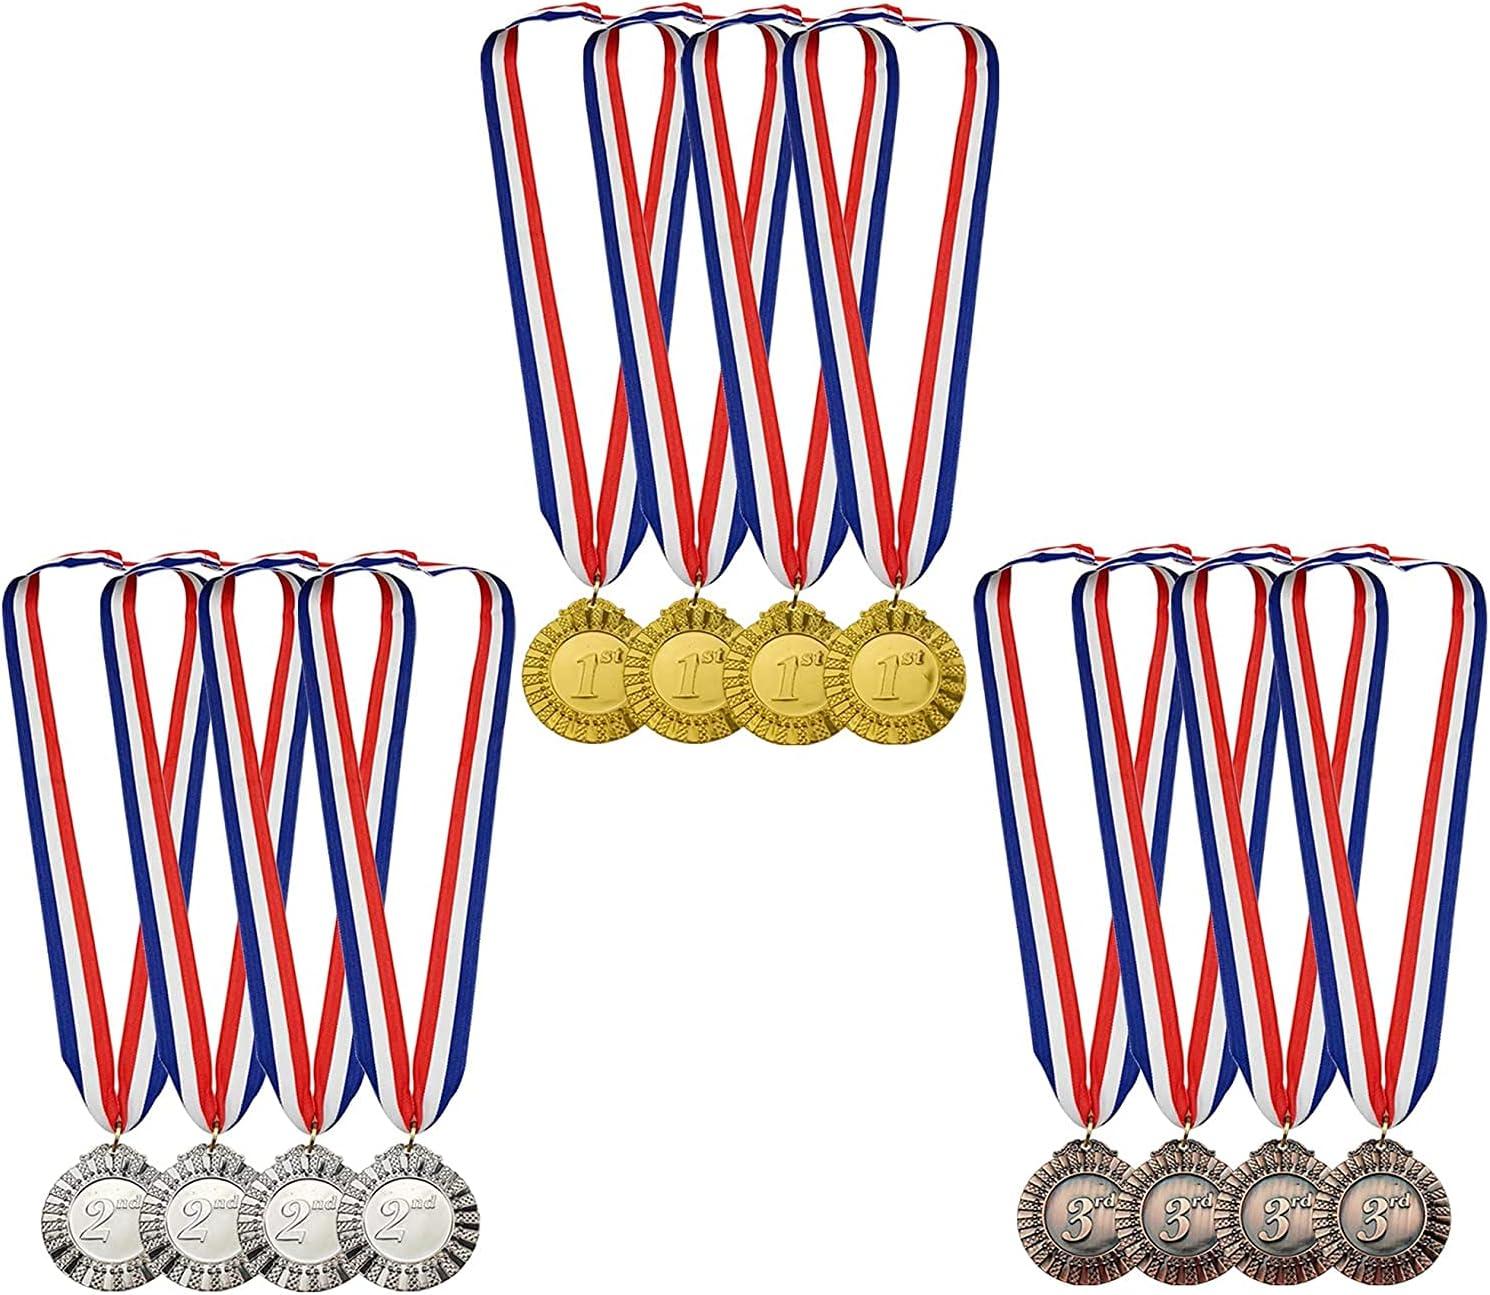 MOMOONNON service 12 Pieces Metal Winner Regular discount Silver Gold Medals Bronze Award